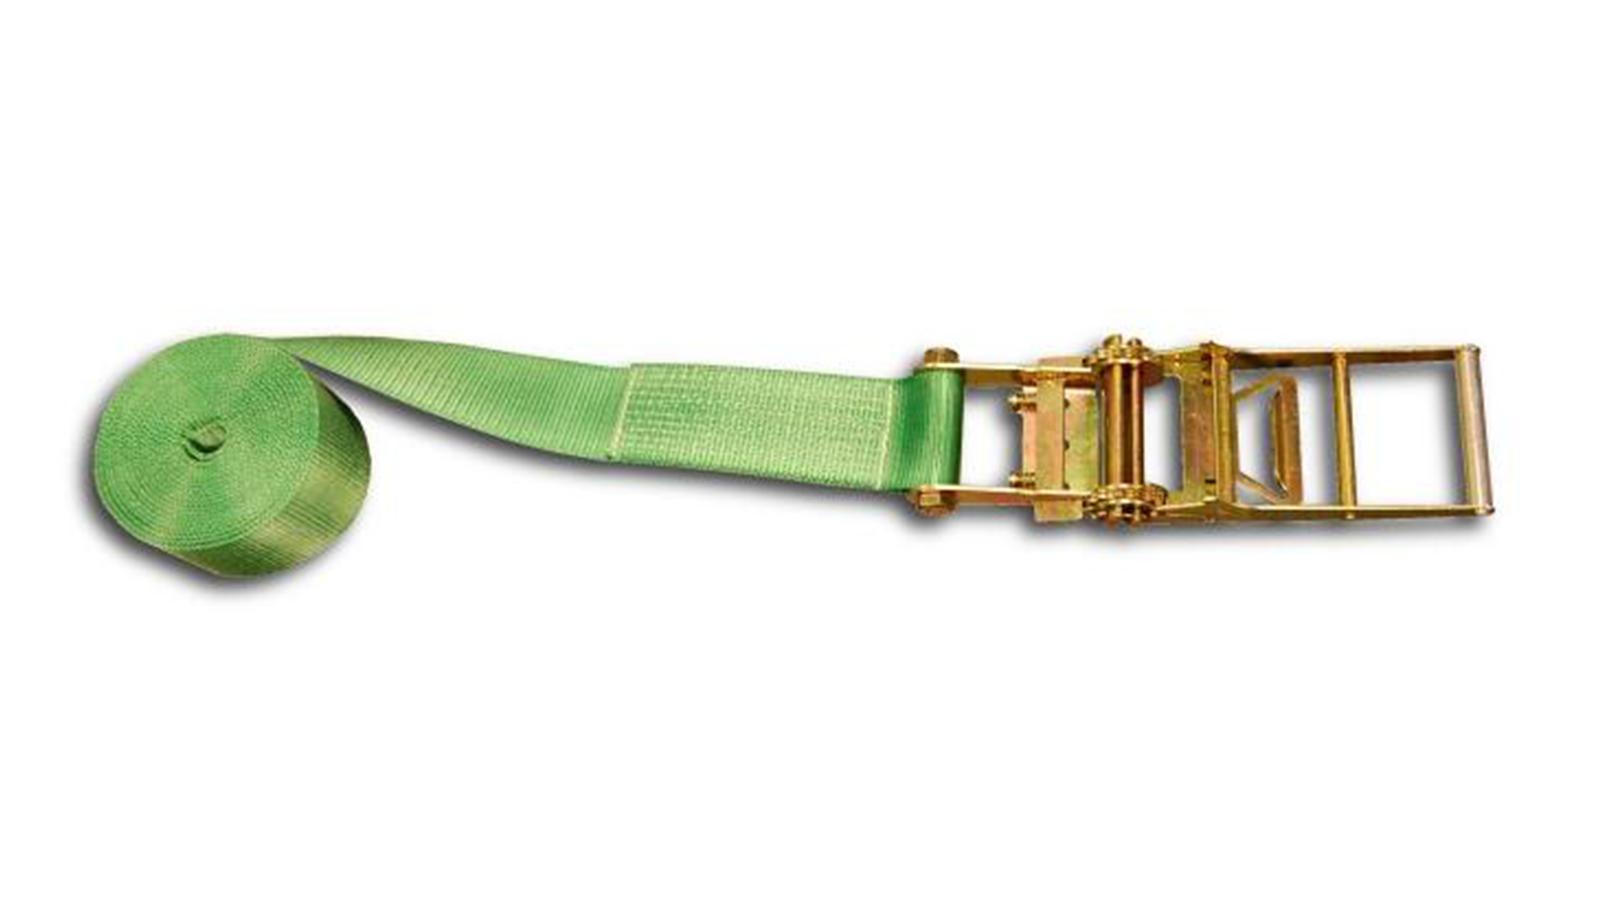 Sjorband 1-delig 100mm EBotex